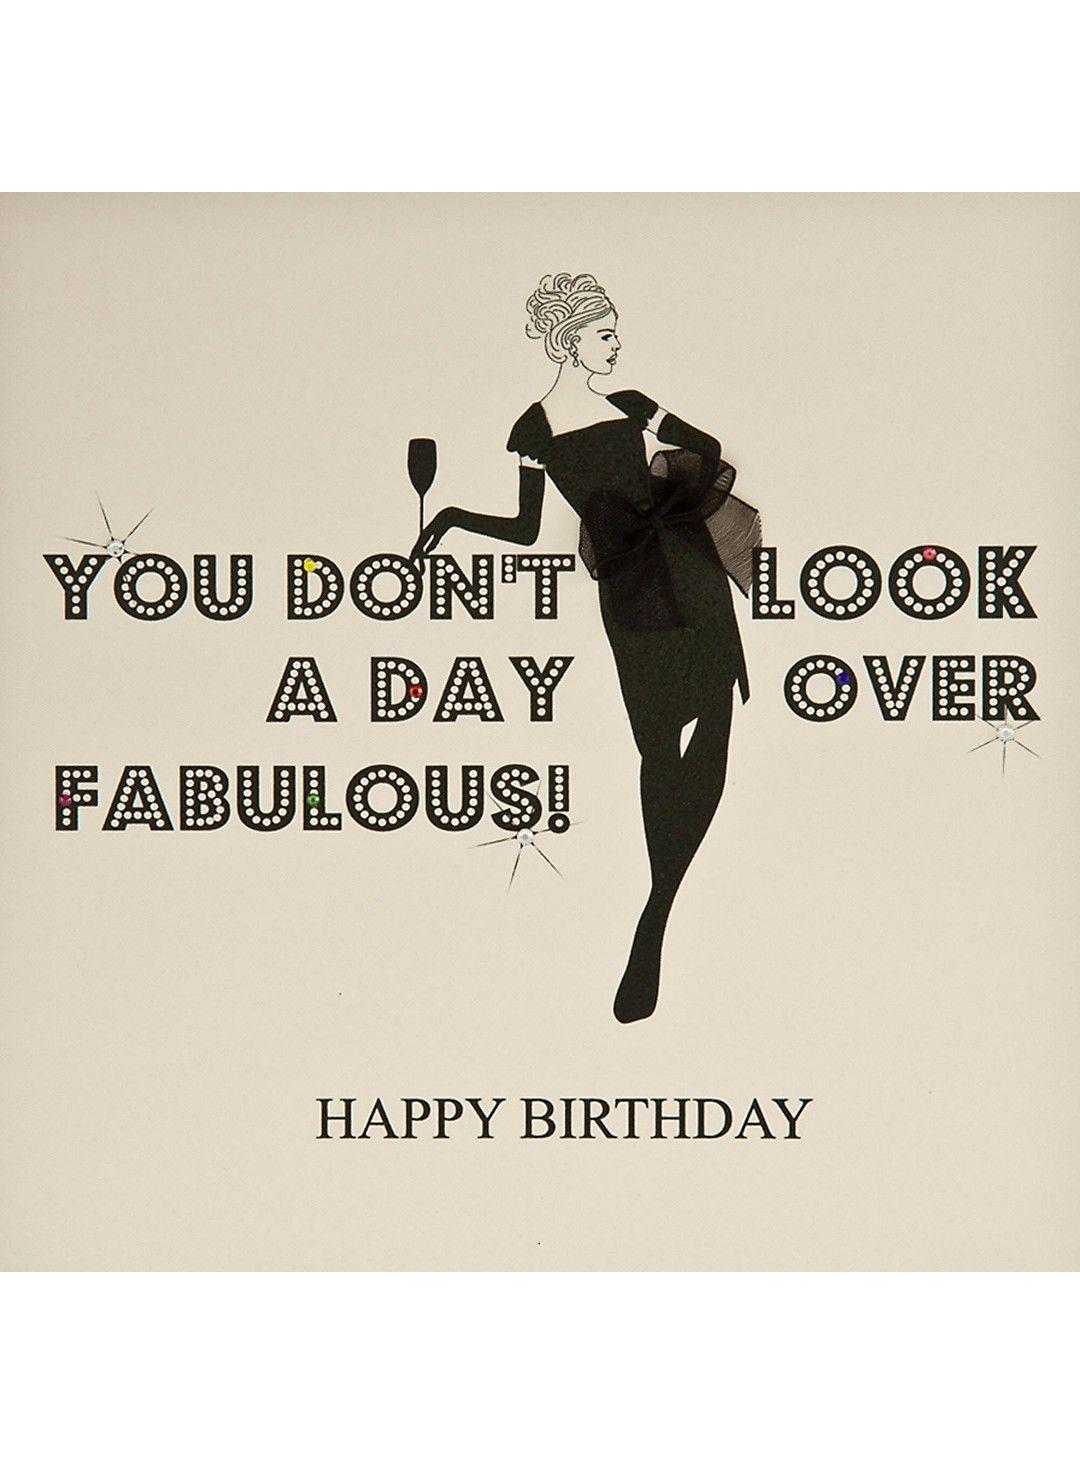 Five Dollar Shake You Don T Look A Day Over Fabulous Birthday Card Selfridges Com Birthday Quotes Funny Birthday Quotes For Daughter Birthday Quotes